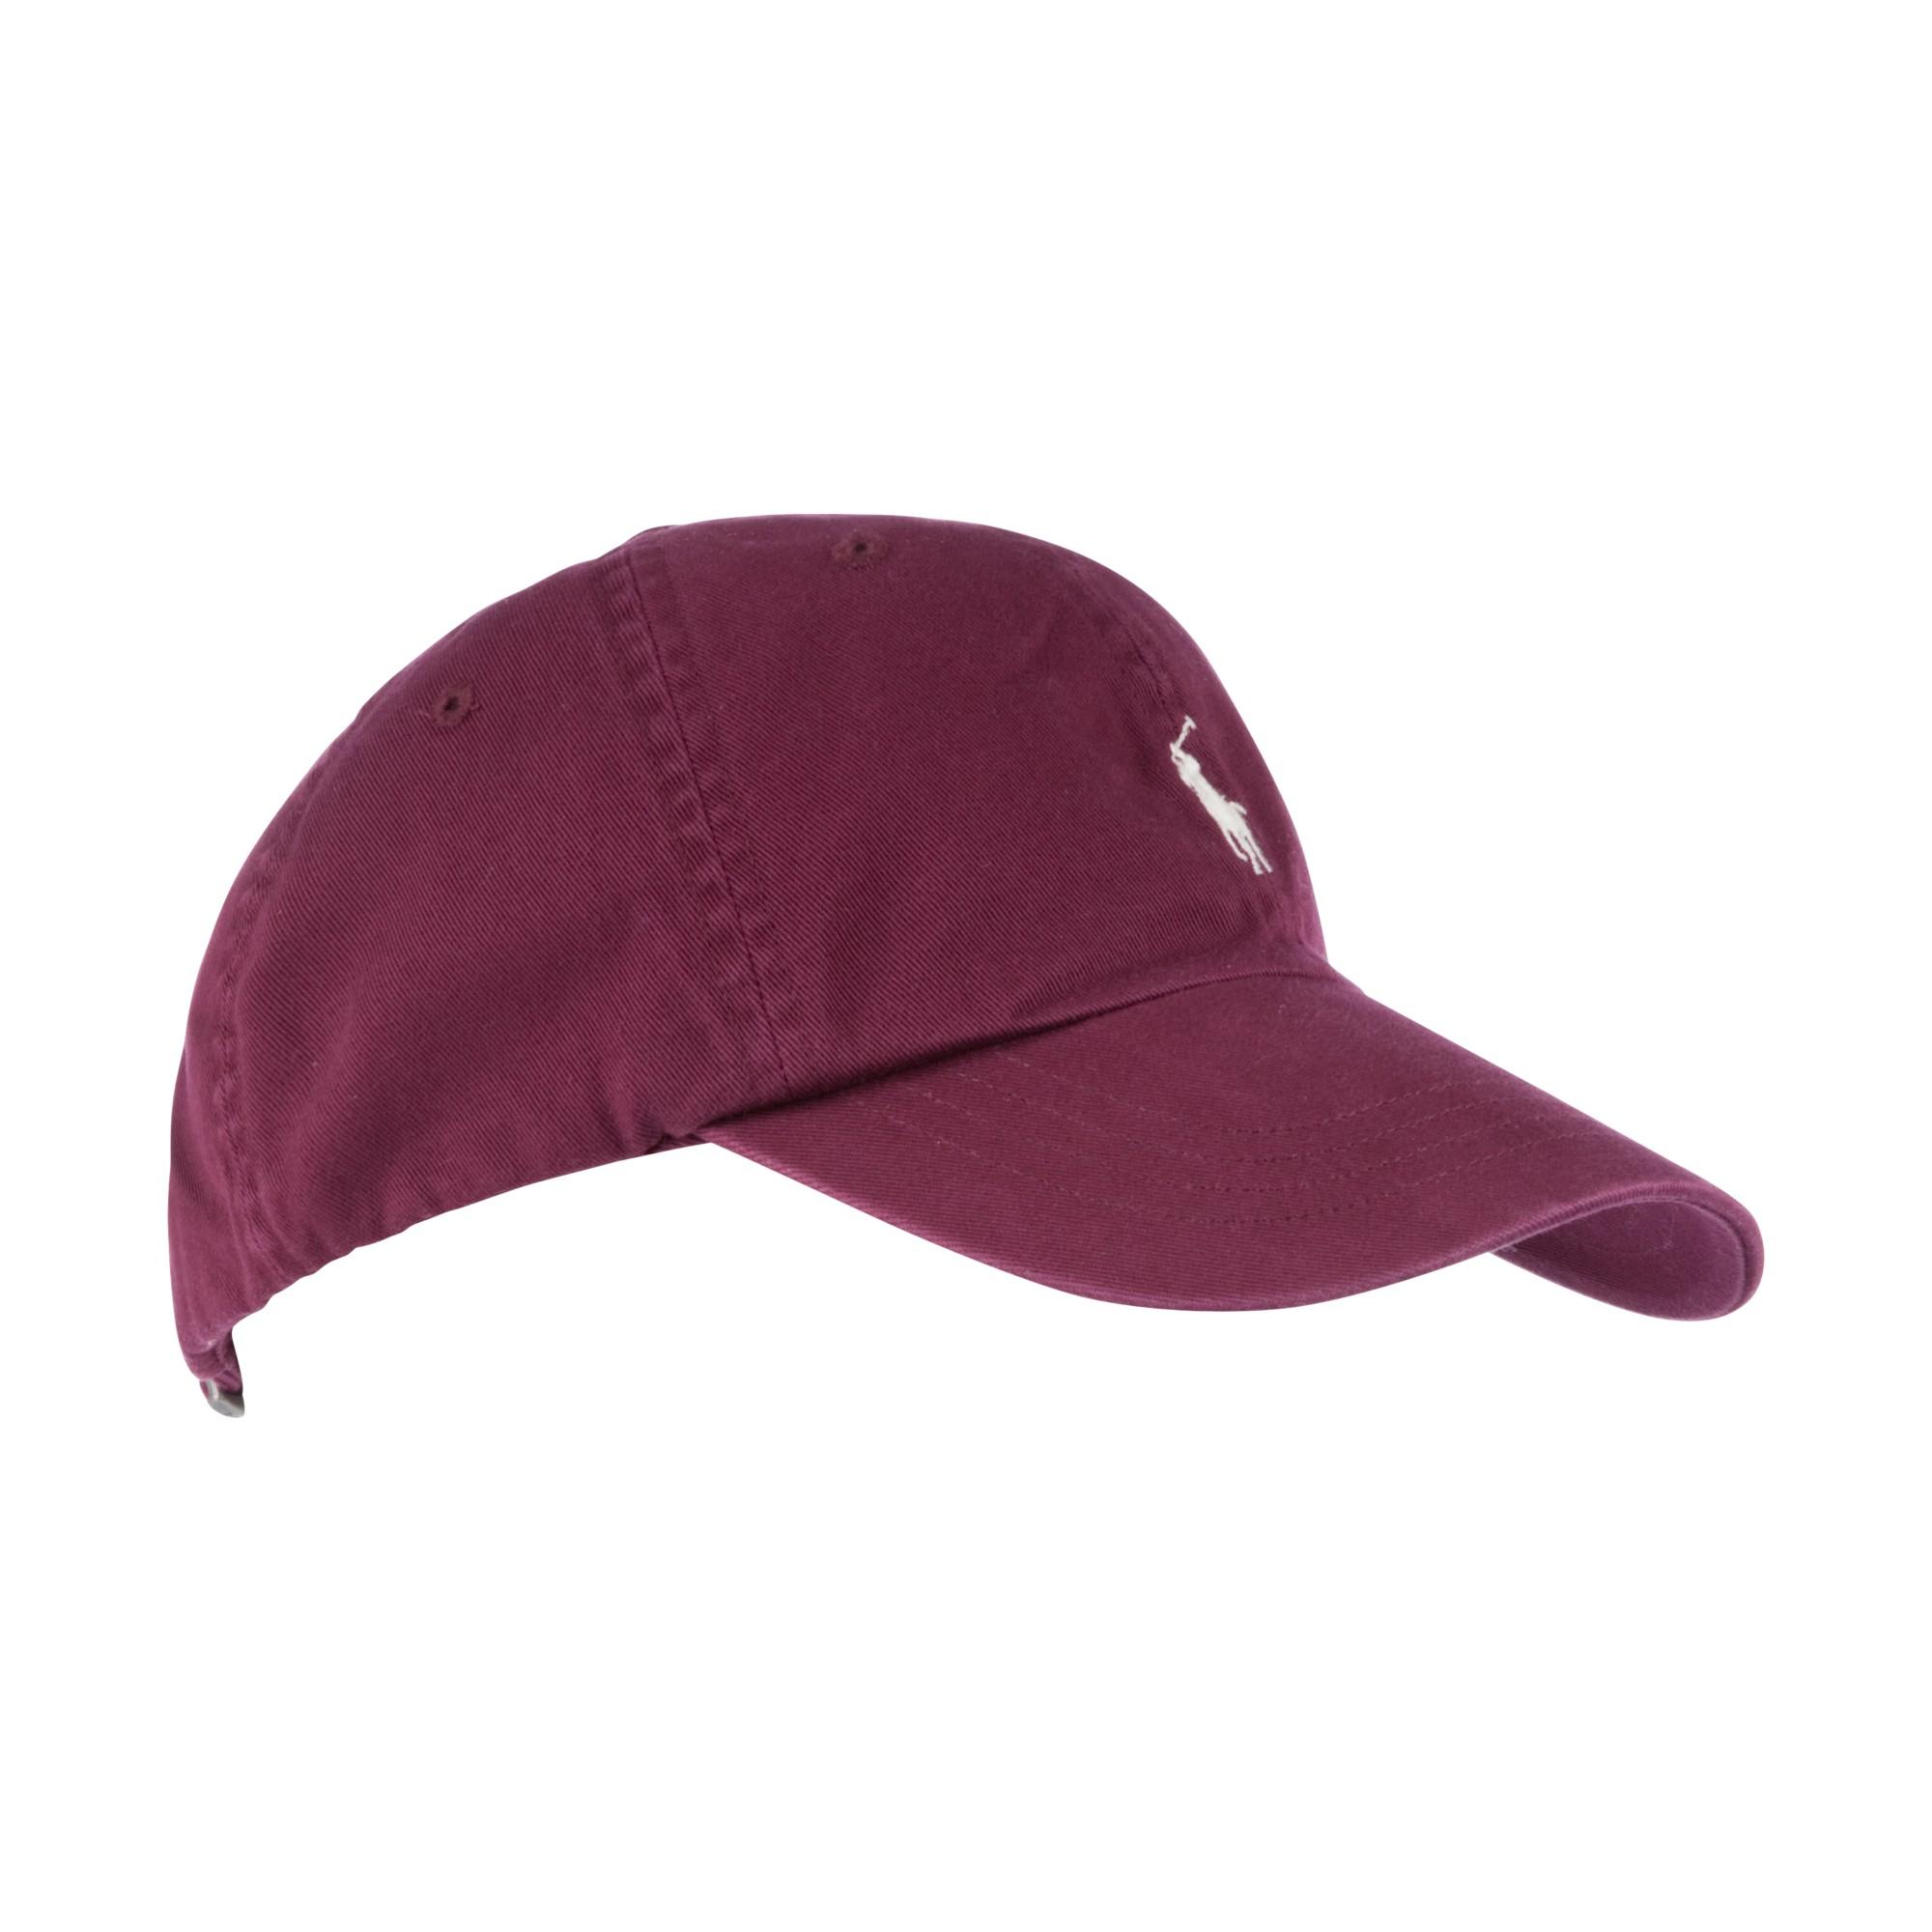 6a963edf82 Polo Ralph Lauren Baseball Cap in Red for Men - Lyst